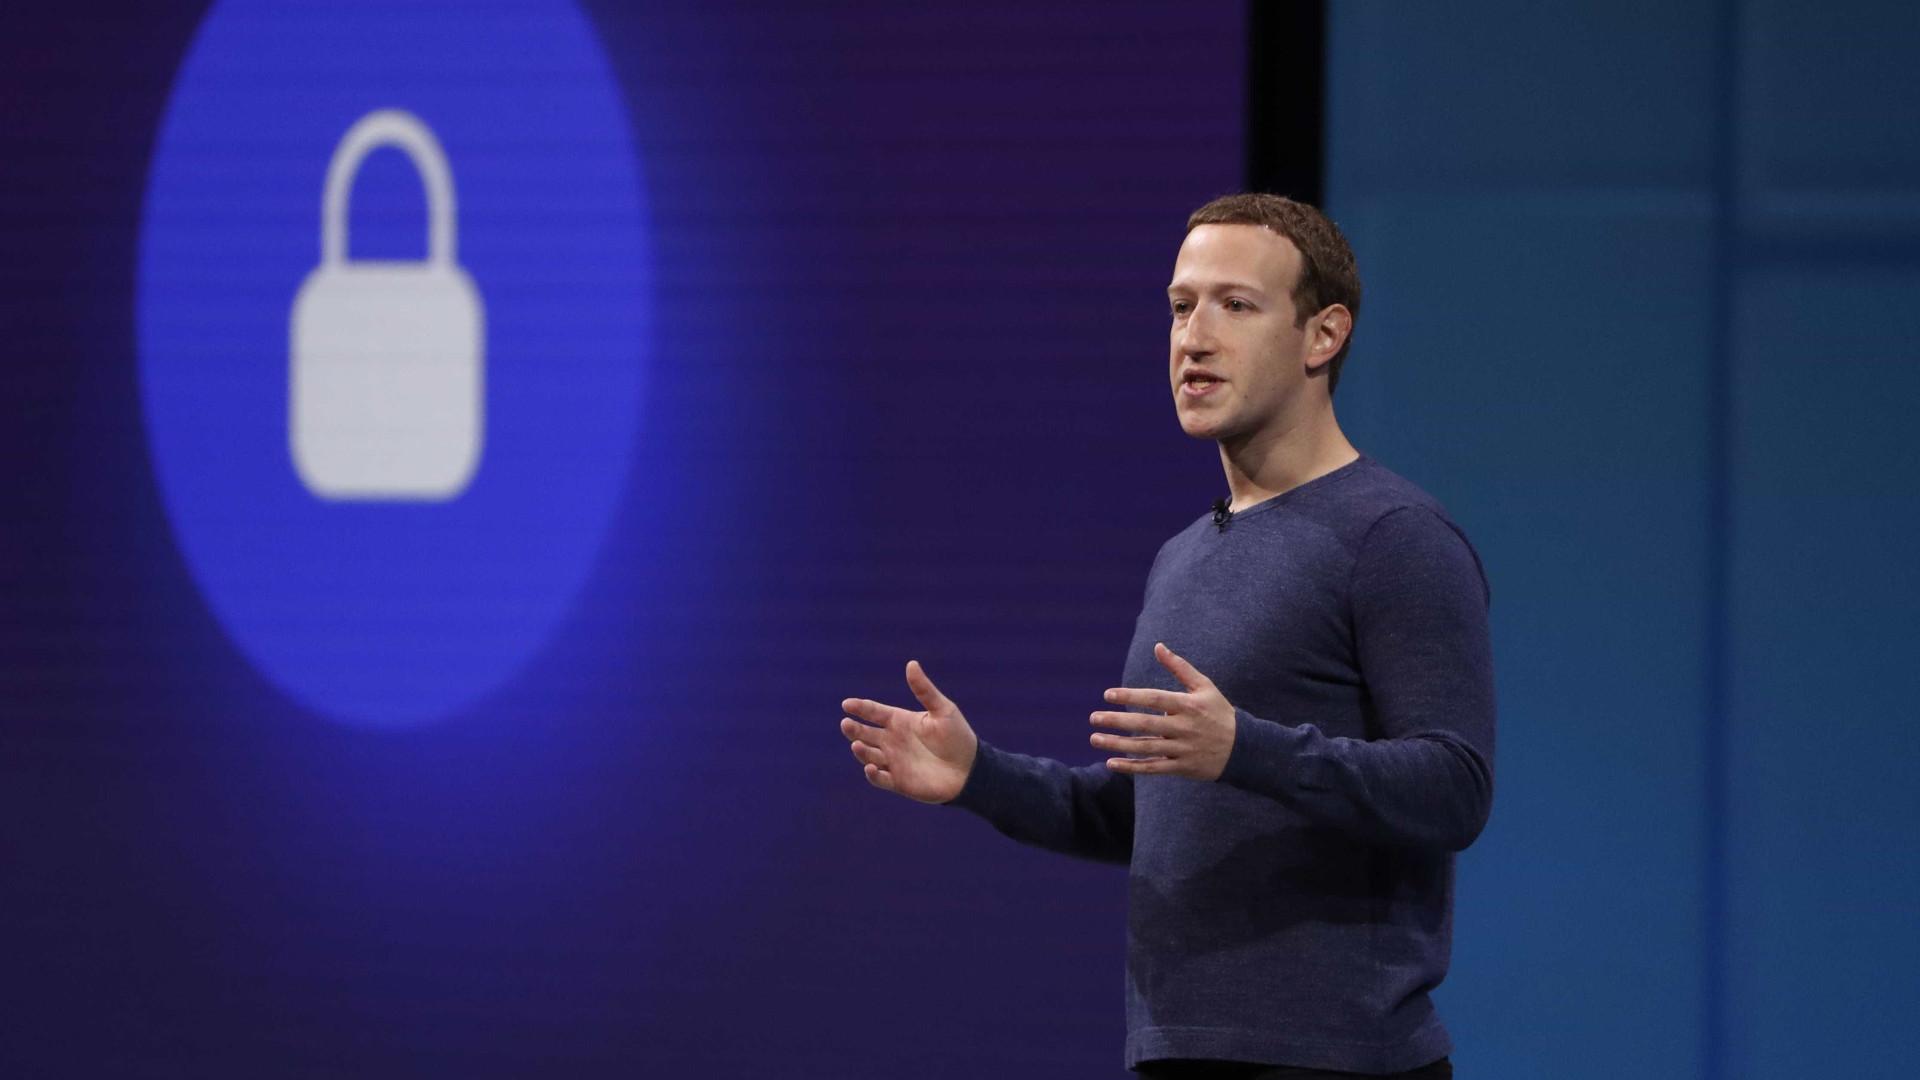 Mark Zuckerberg promete maior privacidade no Facebook